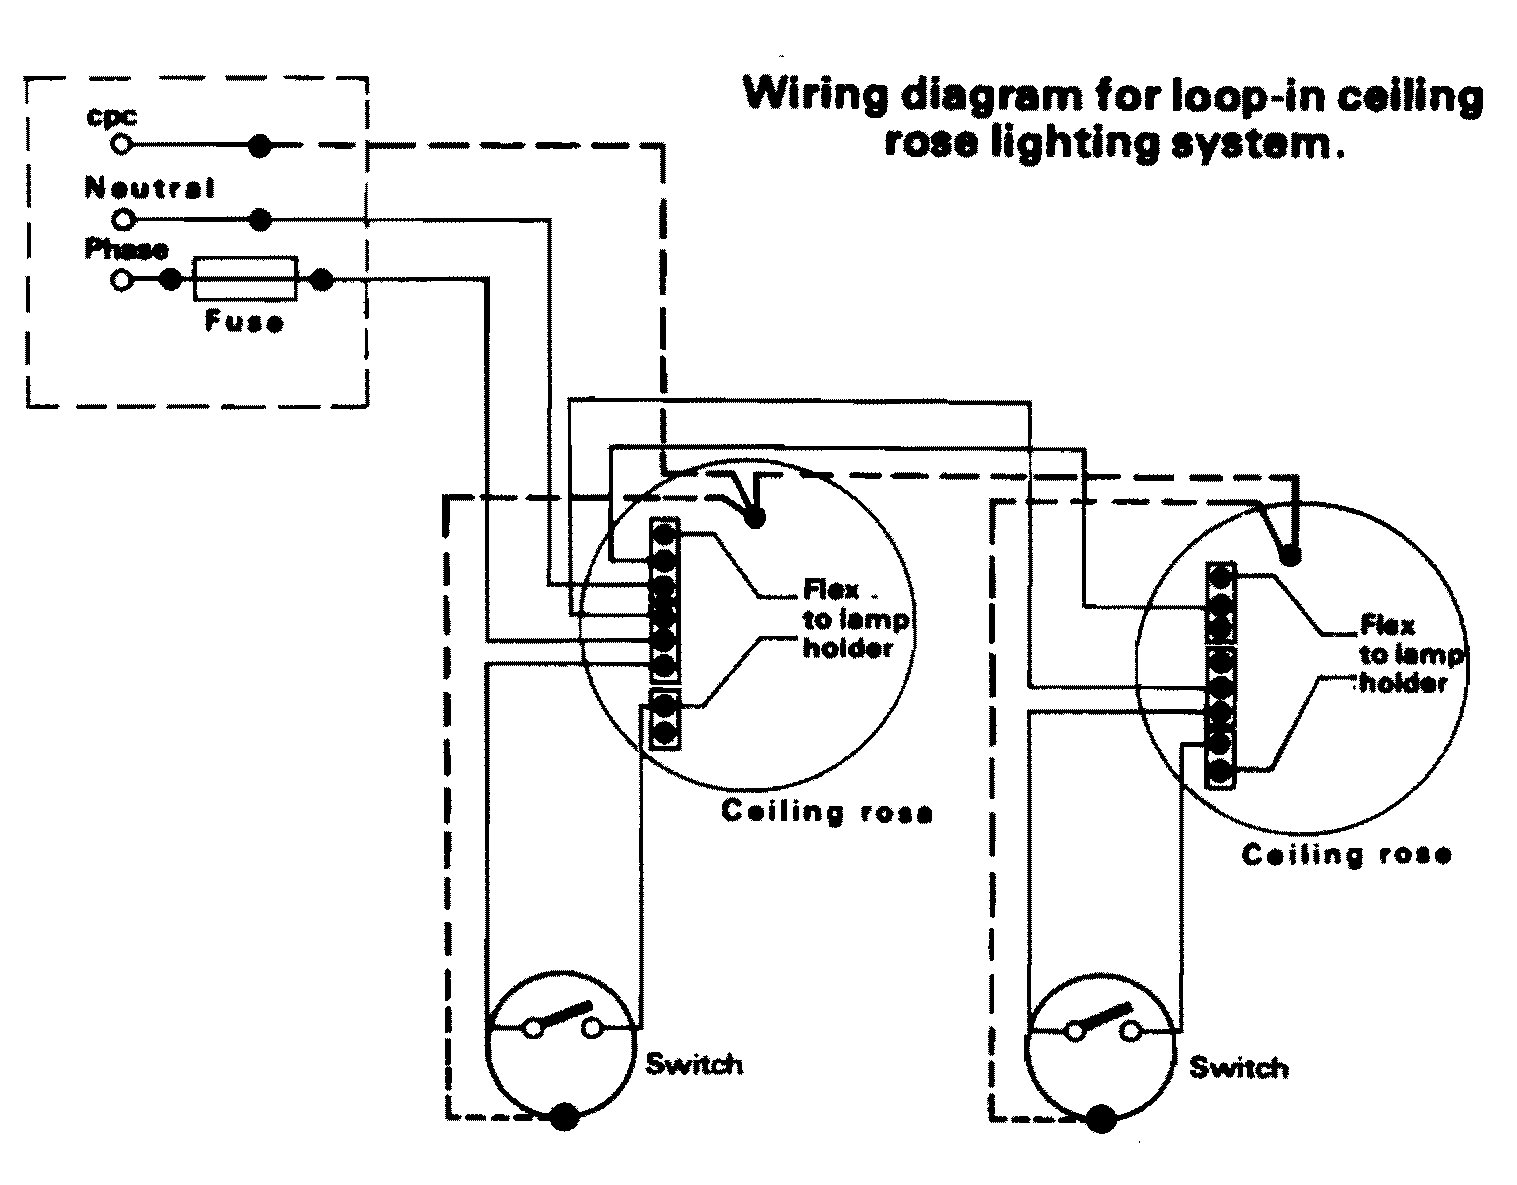 afzal ranjha wiring diagram afzal ranjha easy basic telephone junction box wiring [ 1517 x 1185 Pixel ]